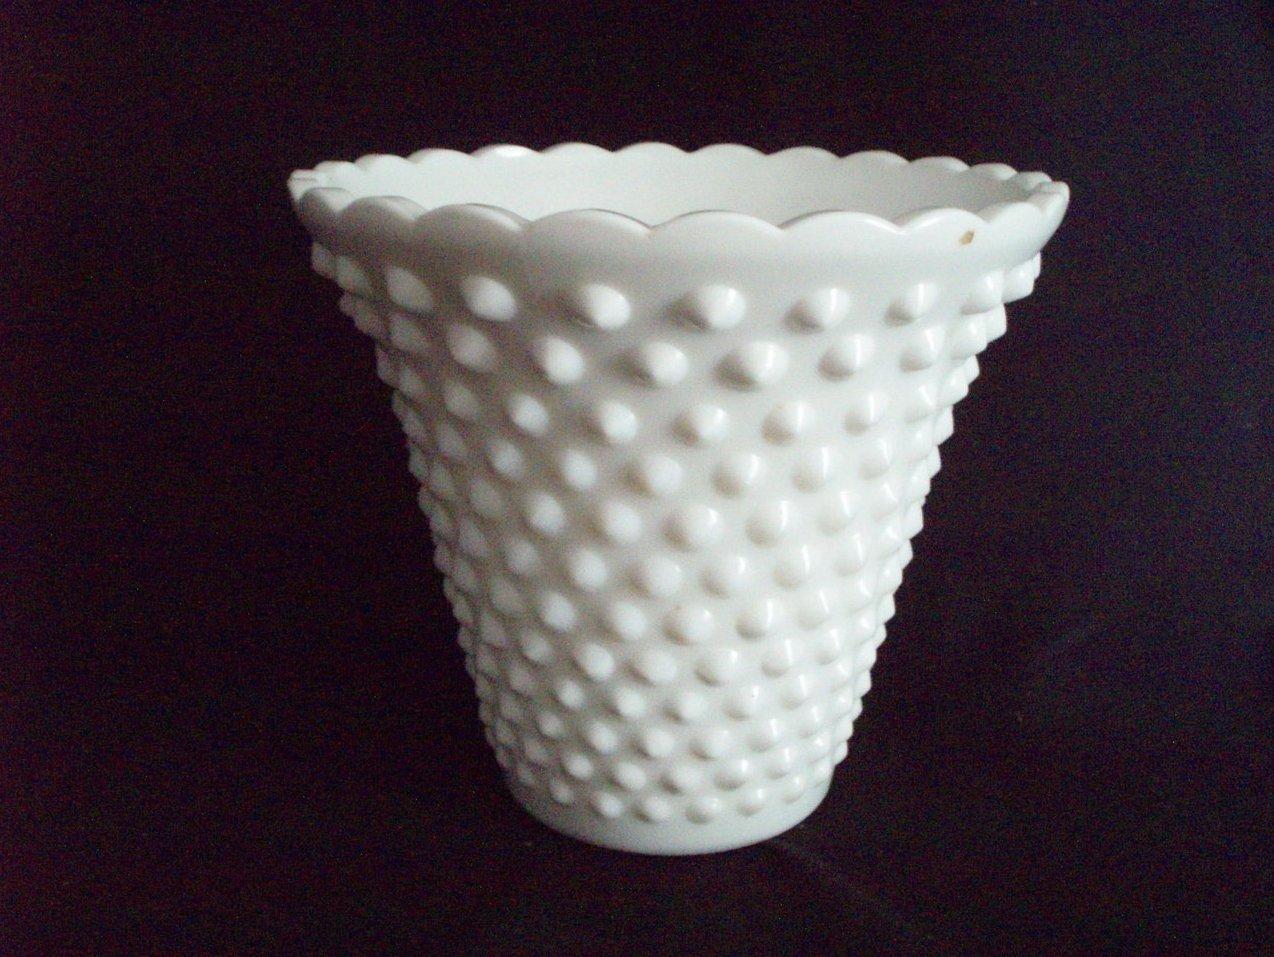 Barntiquestore north american fenton hobnail fenton milk glass hobnail 6 jardiniere vase vintage 3996 mi reviewsmspy